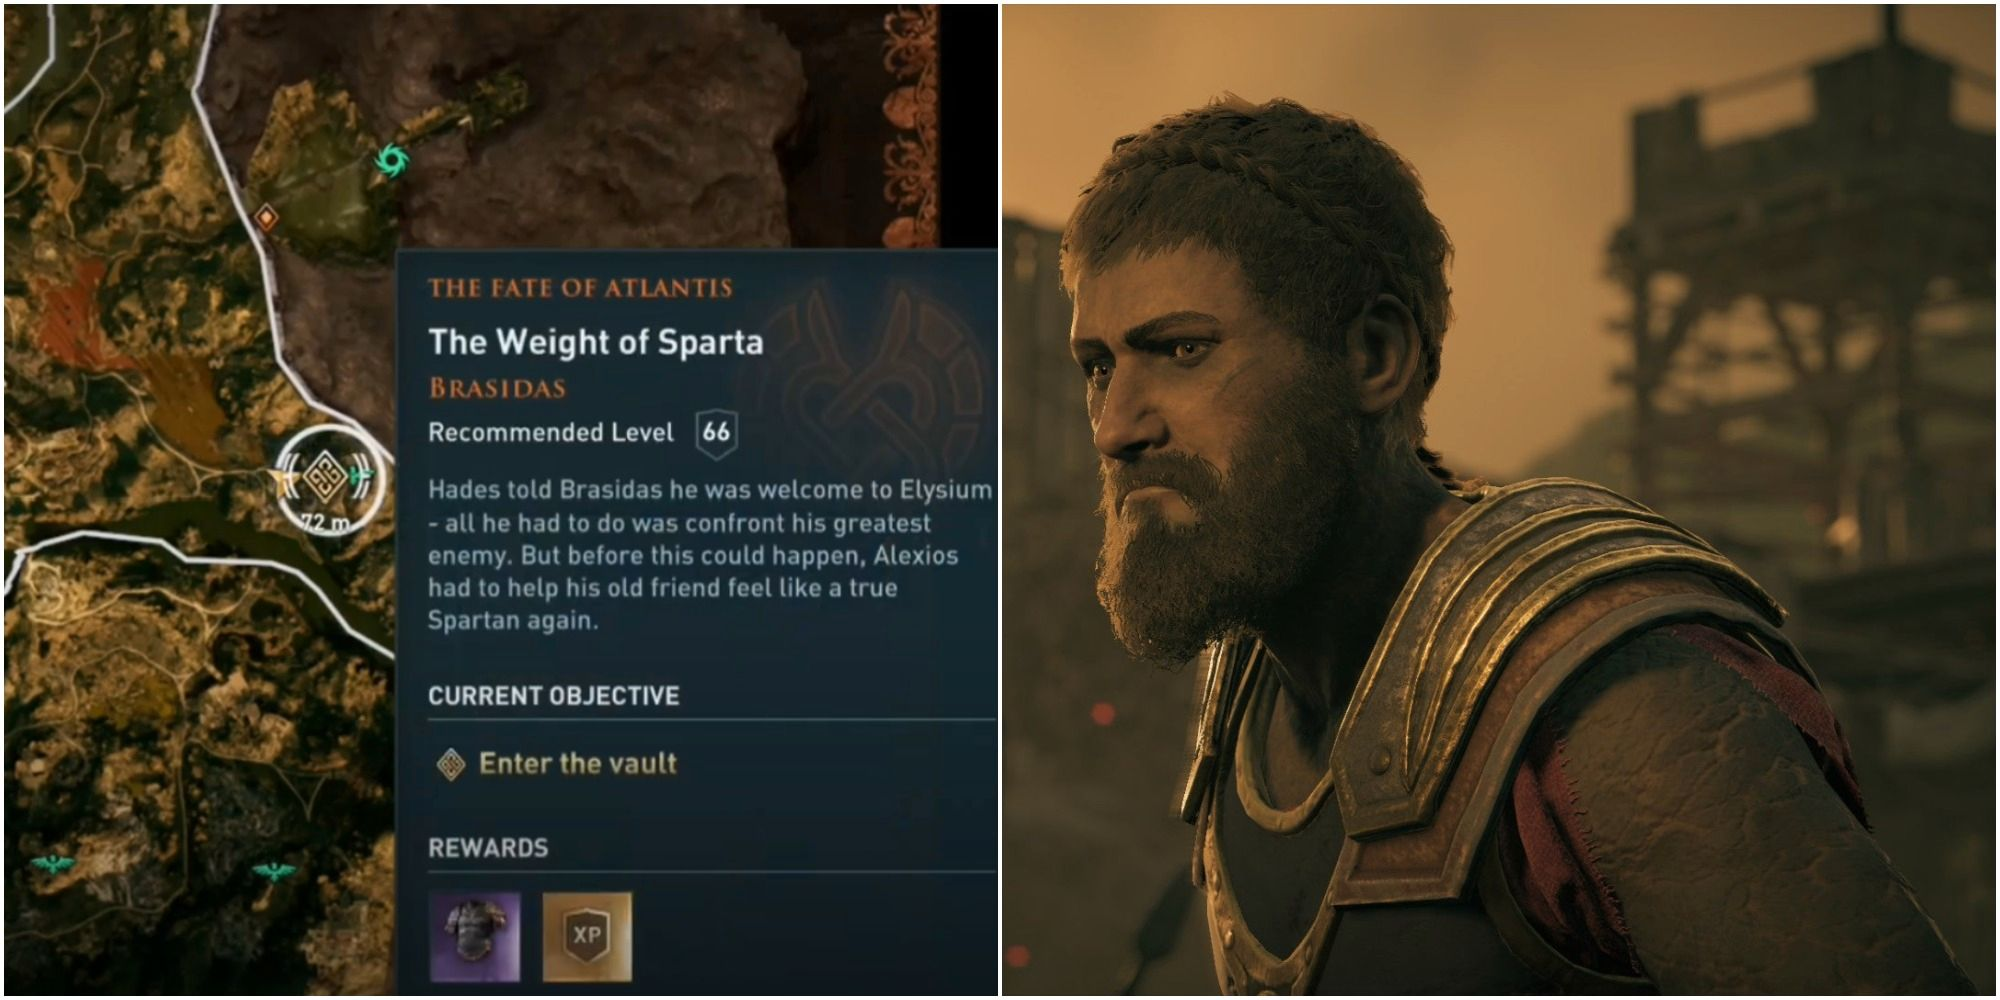 Assassin's Creed Odyssey: El destino de Atlantis The Weight of Sparta Quest Tutorial